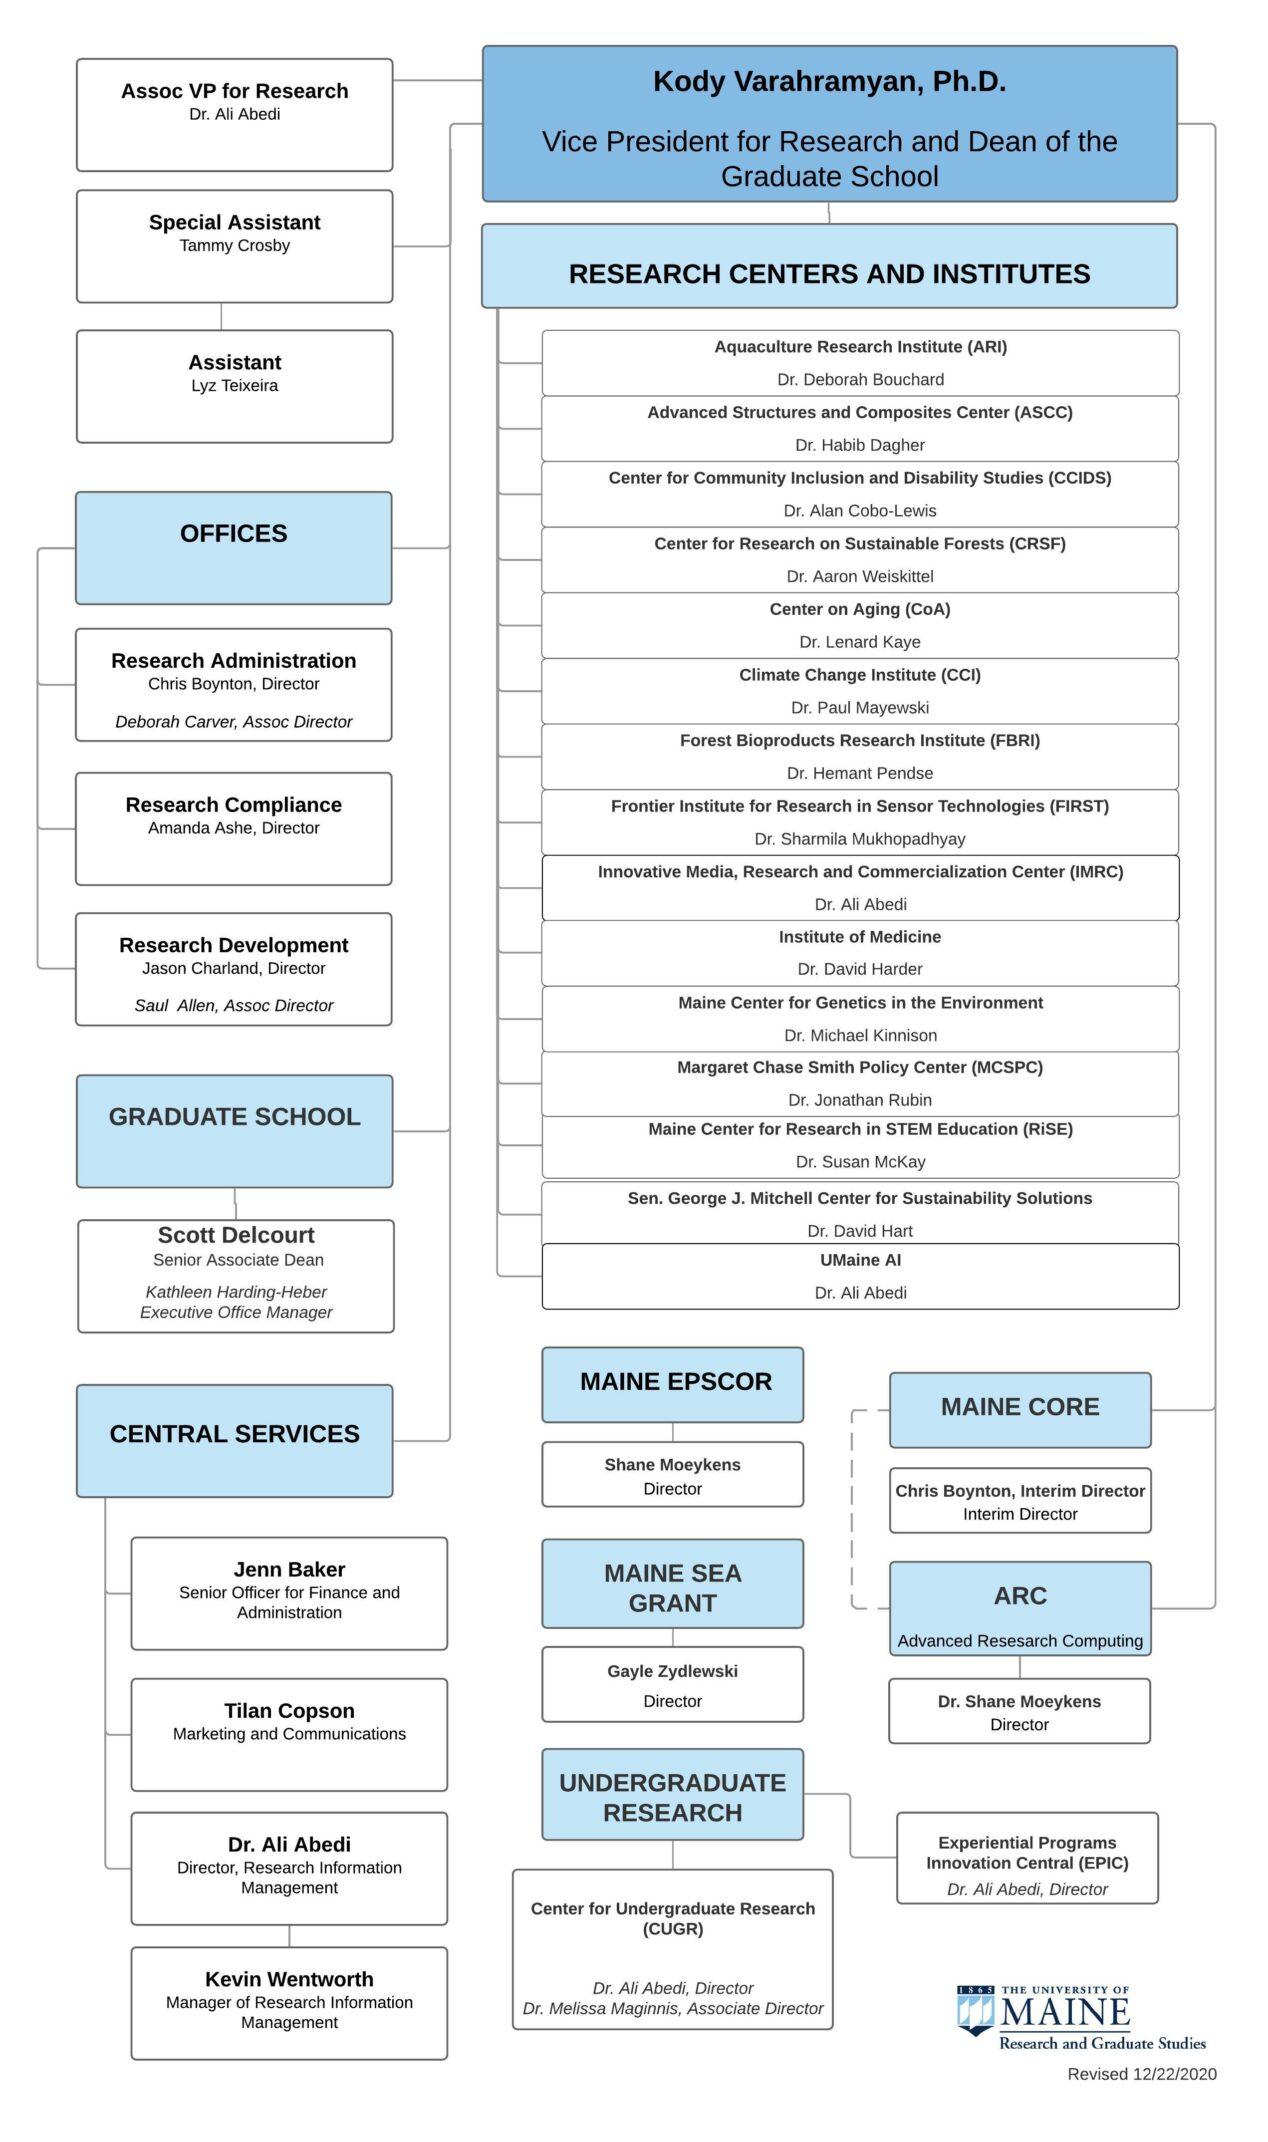 OVPRDGS Org Chart